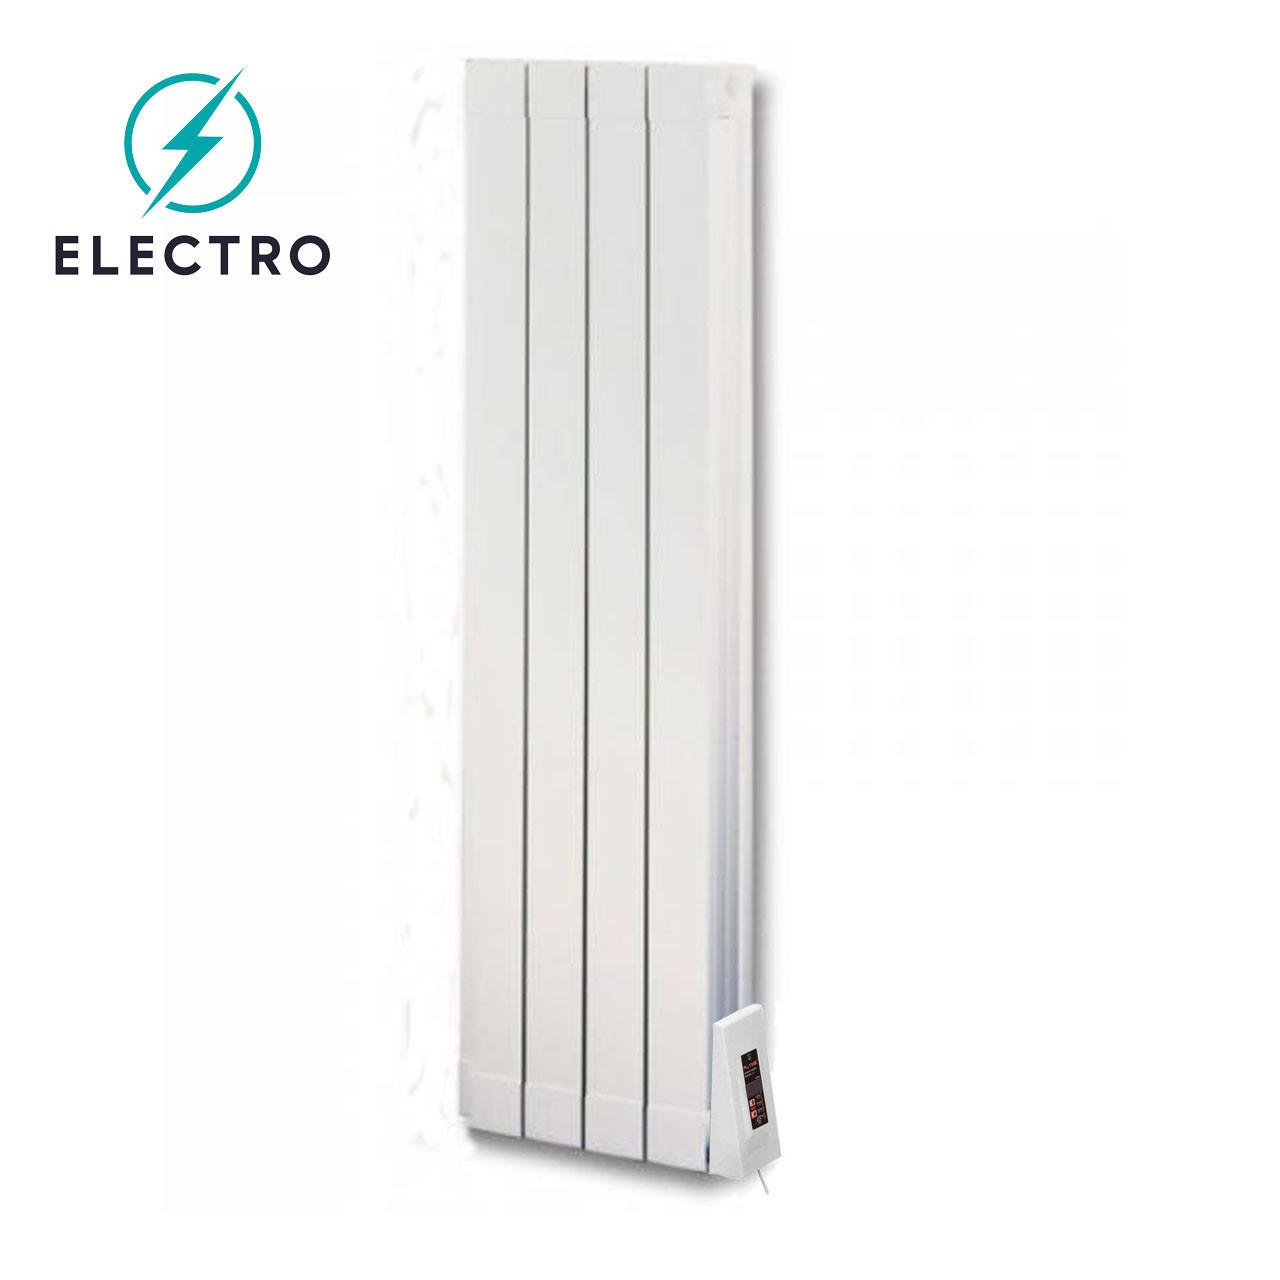 Электрорадиатор ELECTRO.G4W, премиум 1400/96 (250Вт)